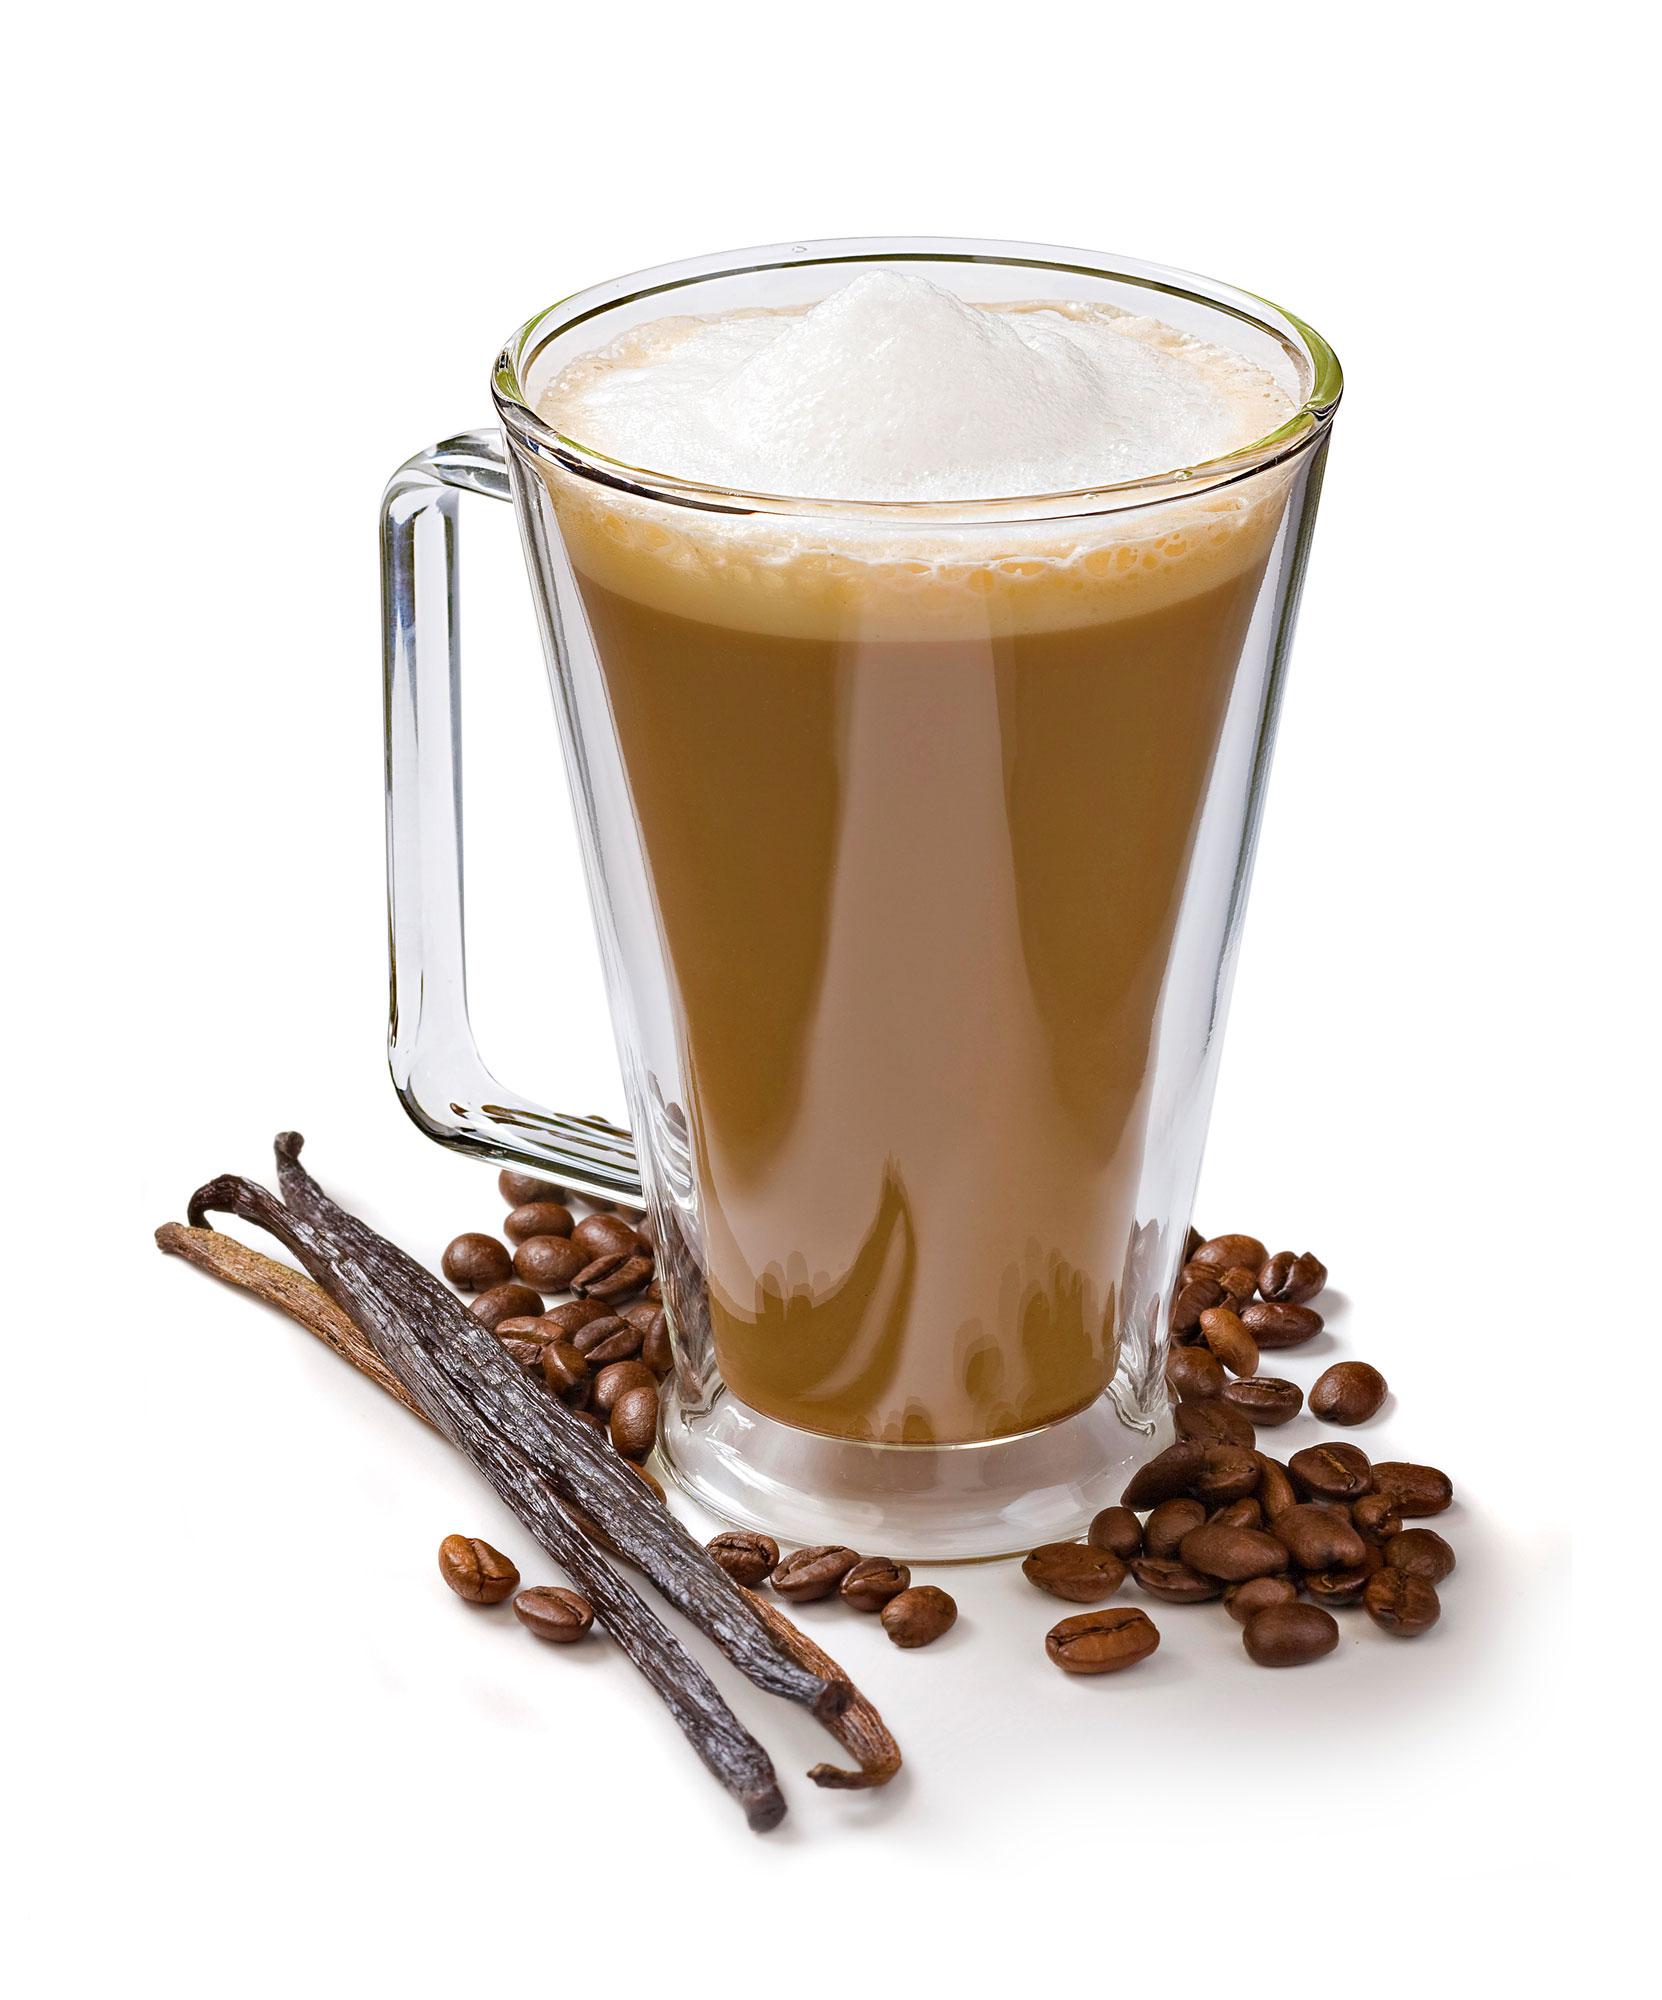 Custom blending of cappuccino and hot chocolate mixes.